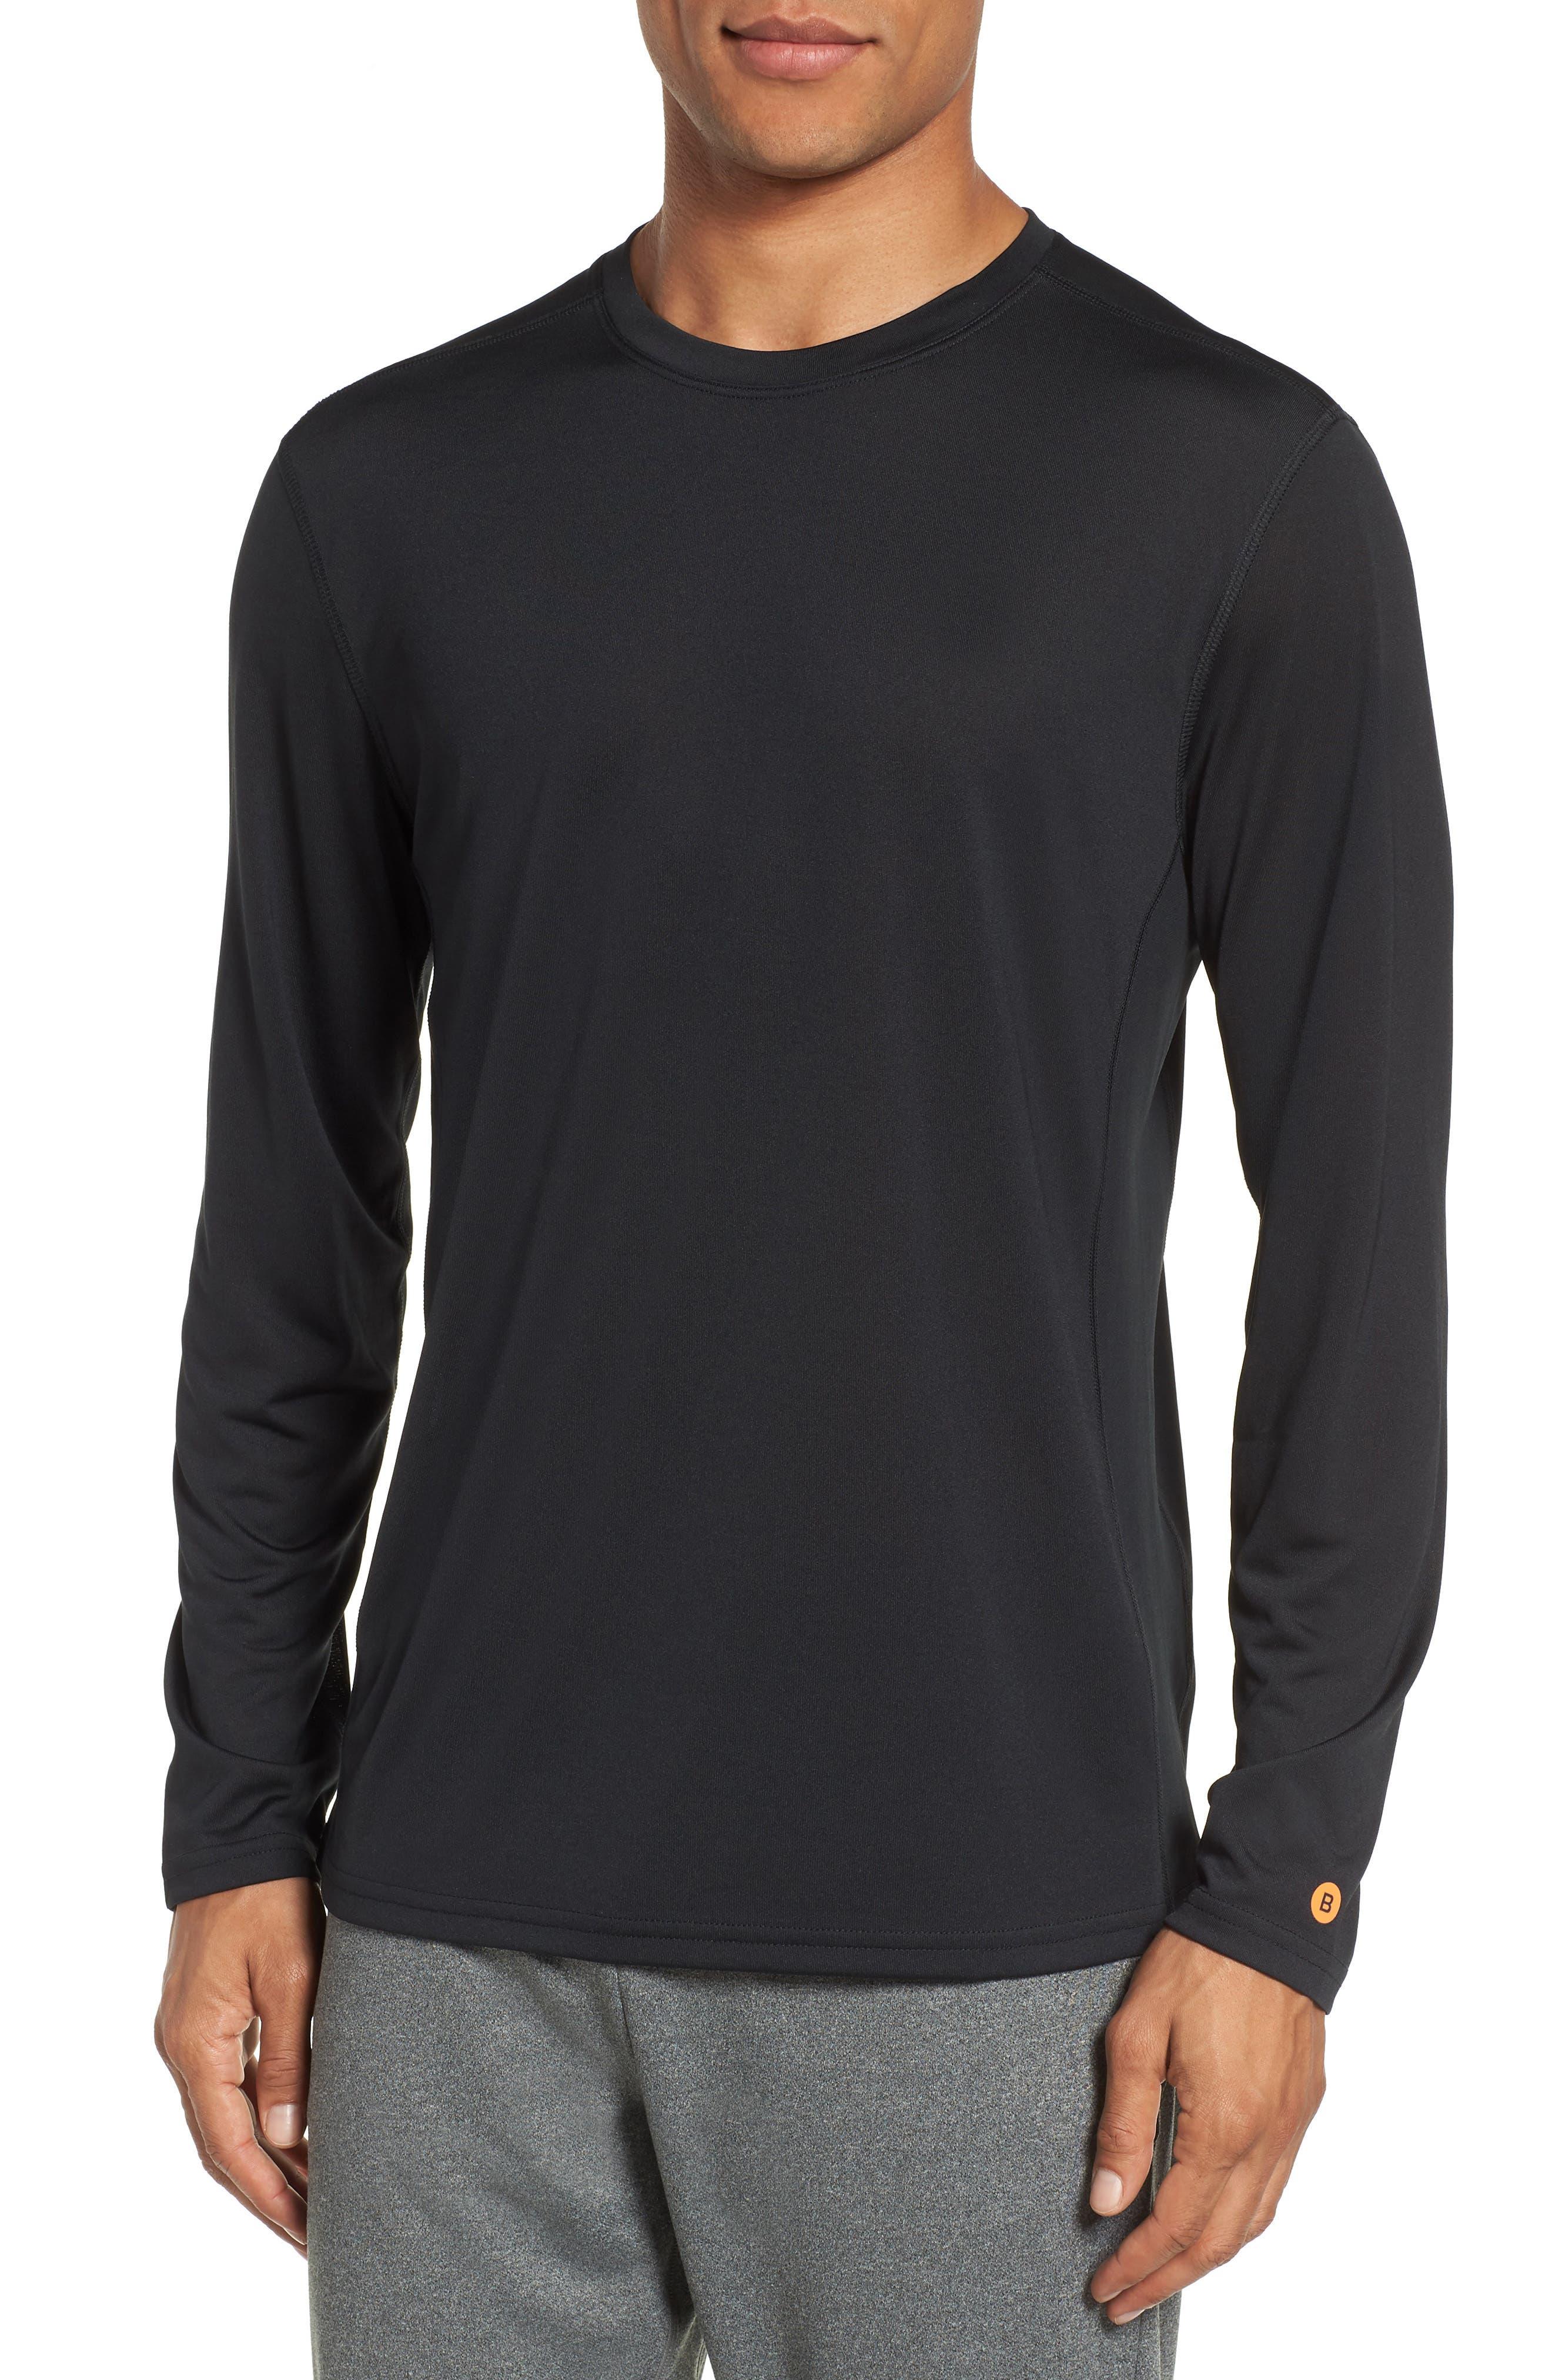 Goodsport T-Shirt,                         Main,                         color, JET BLACK